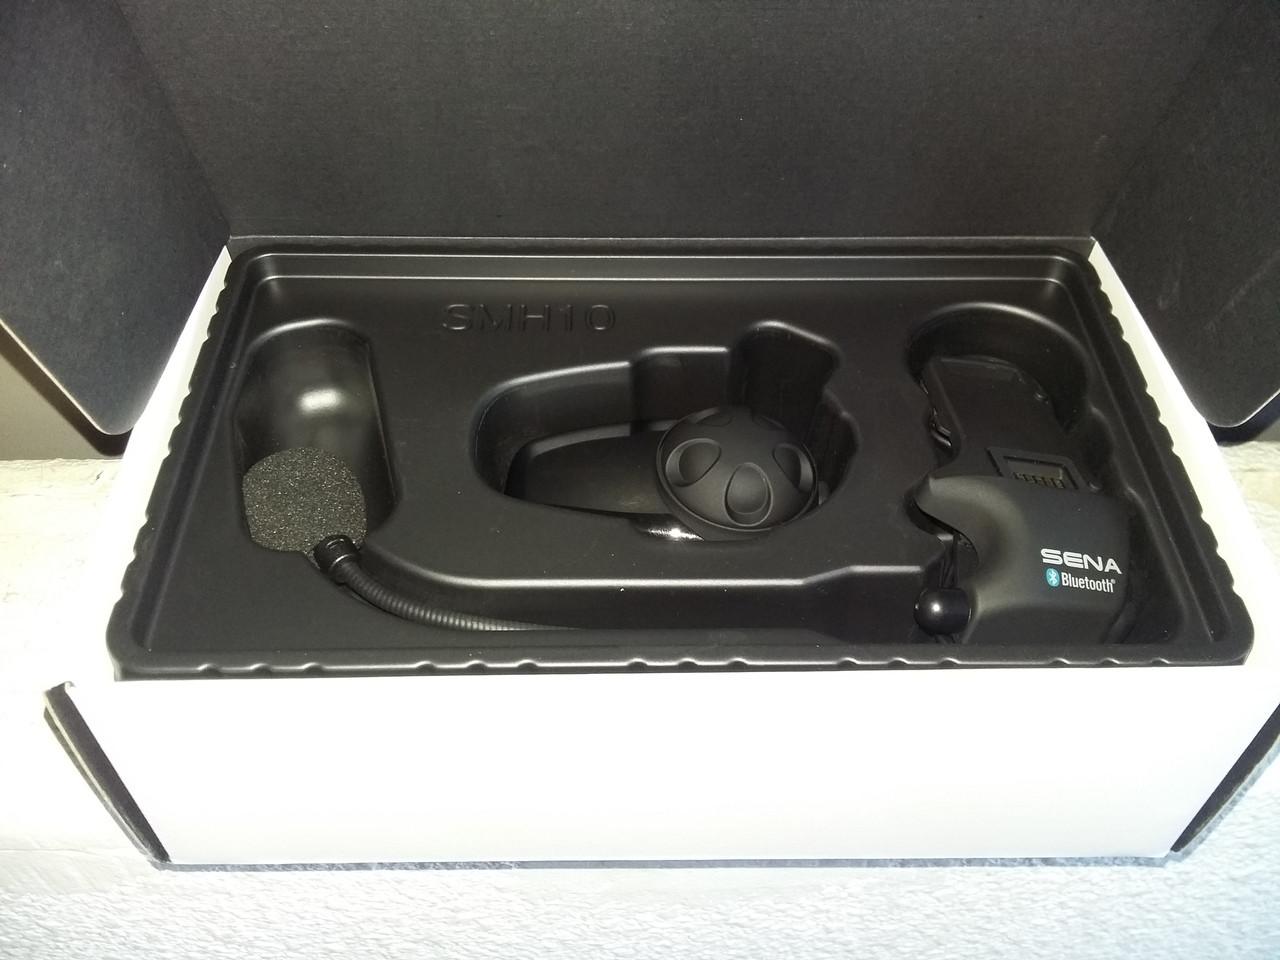 SENA SMH10 Bluetooth Headset and Intercom (Single)